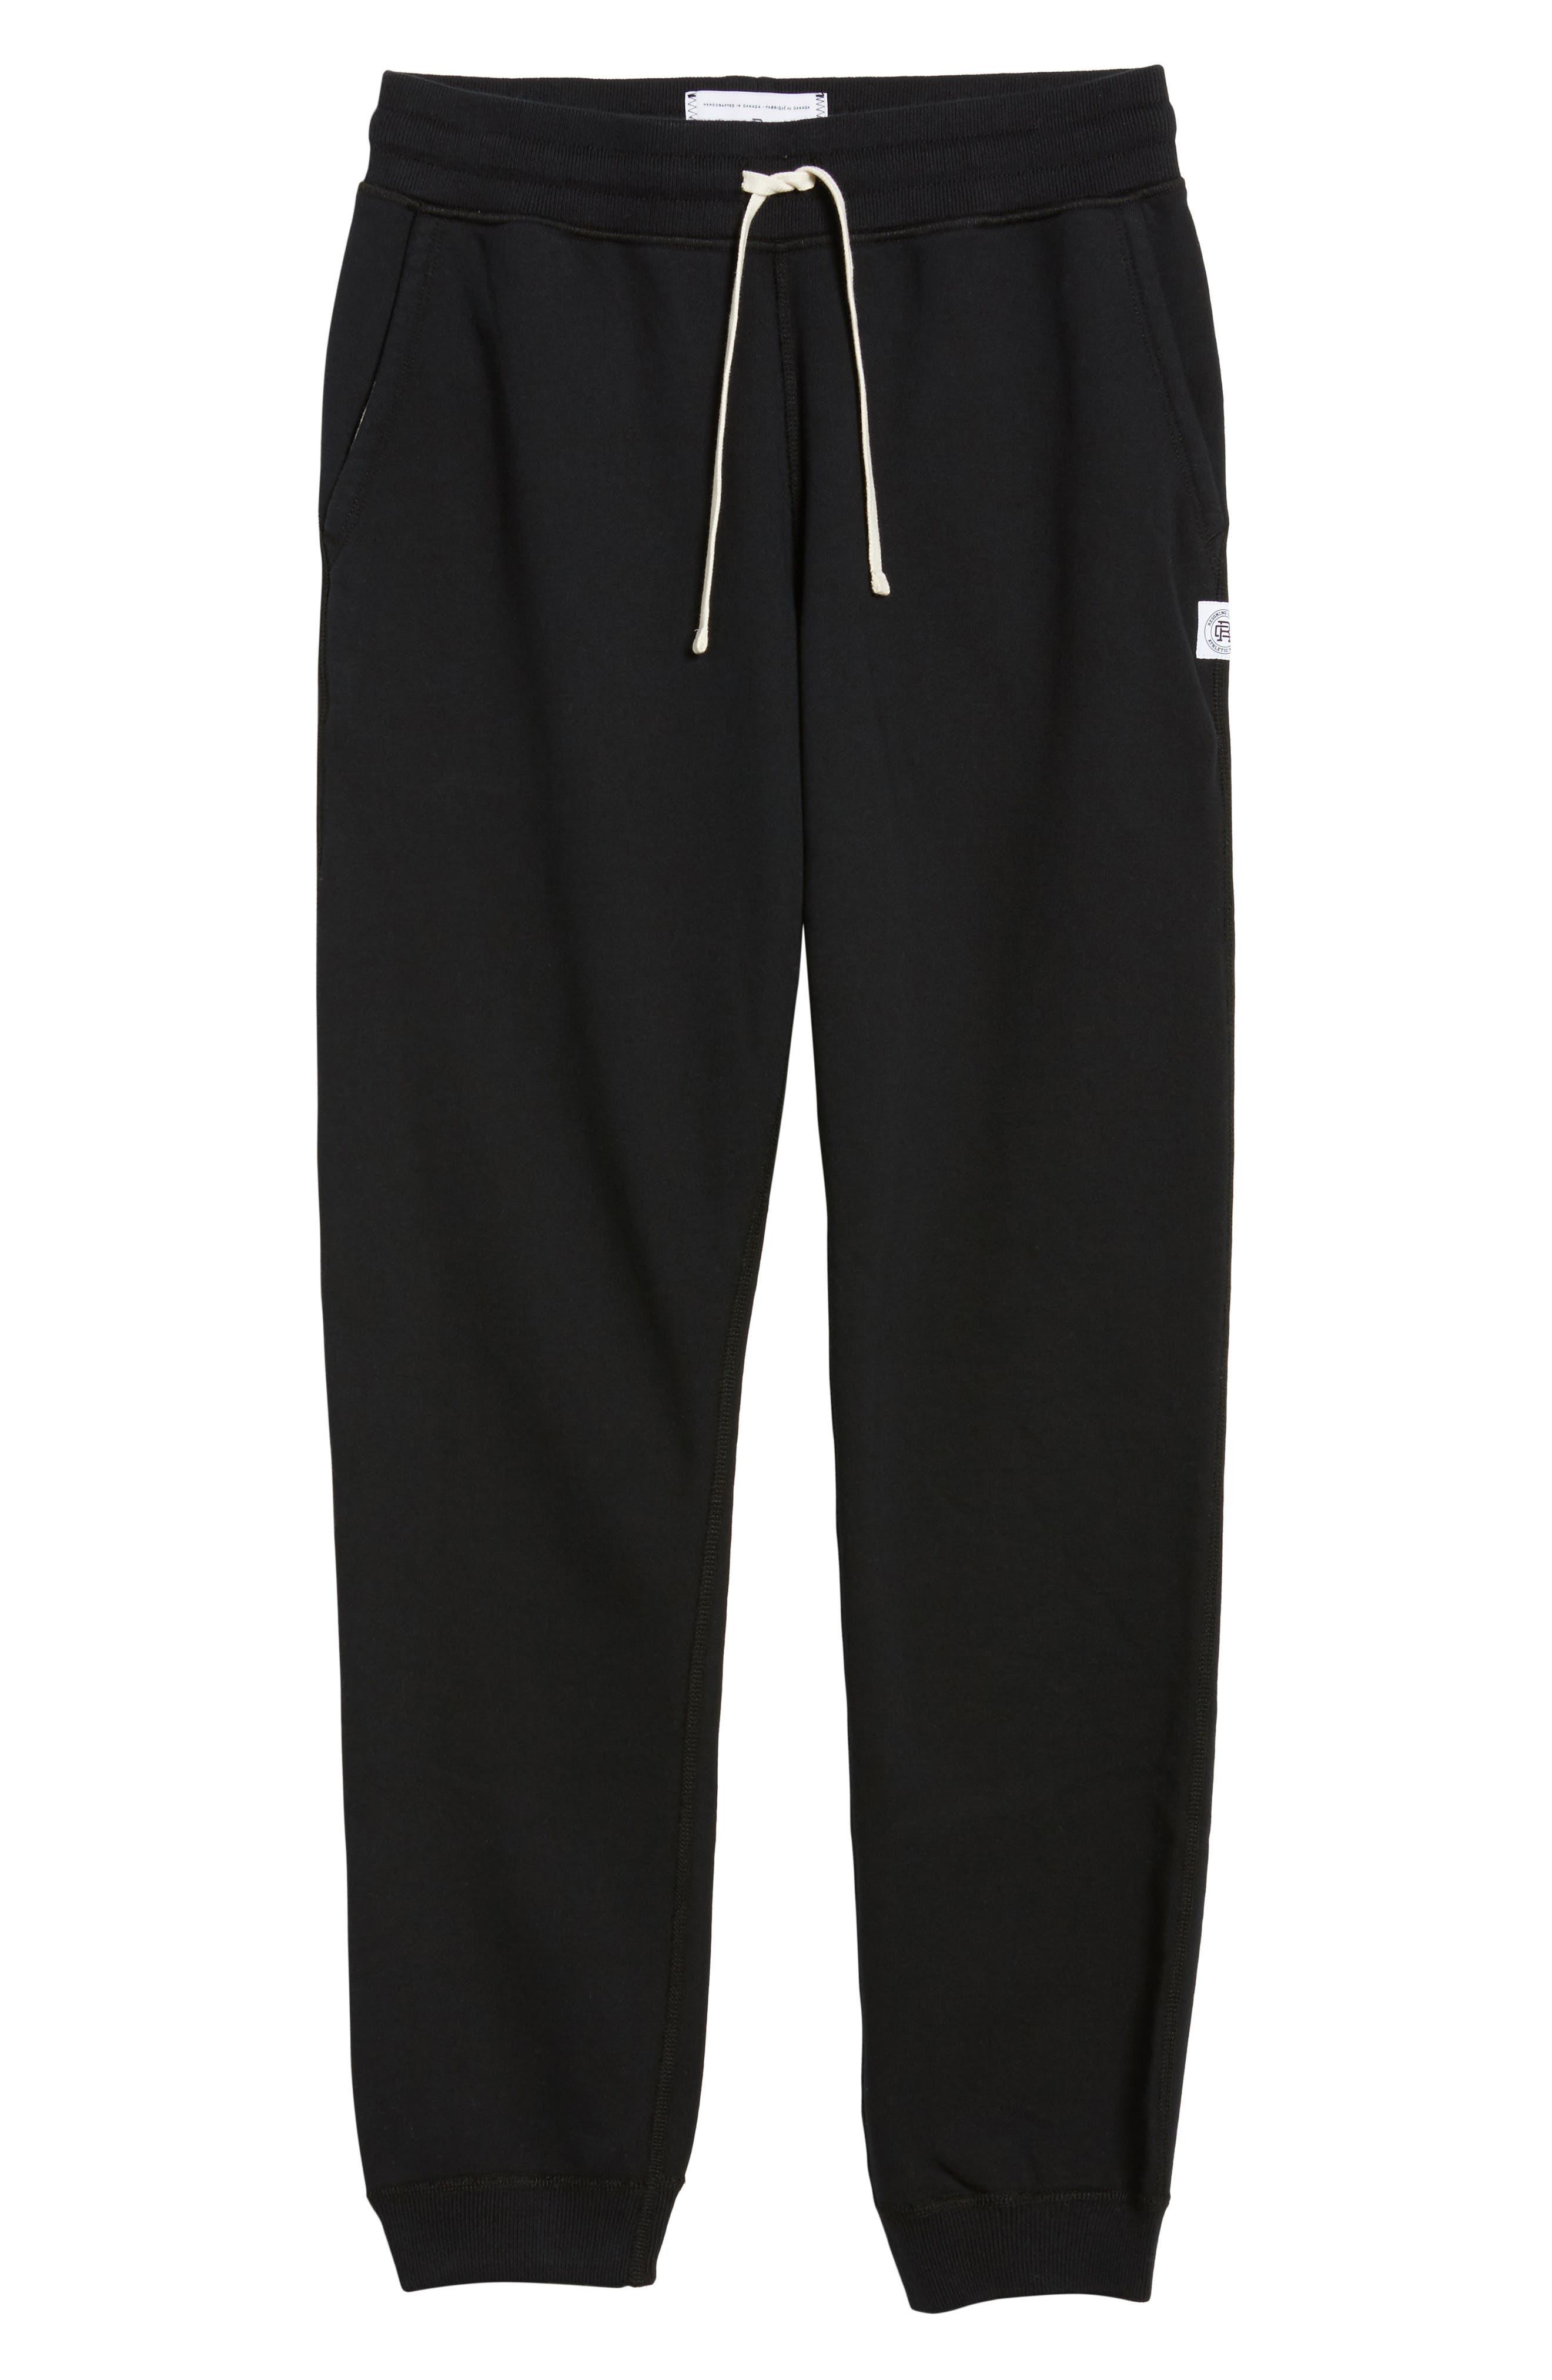 Slim Fit Sweatpants,                             Main thumbnail 1, color,                             BLACK